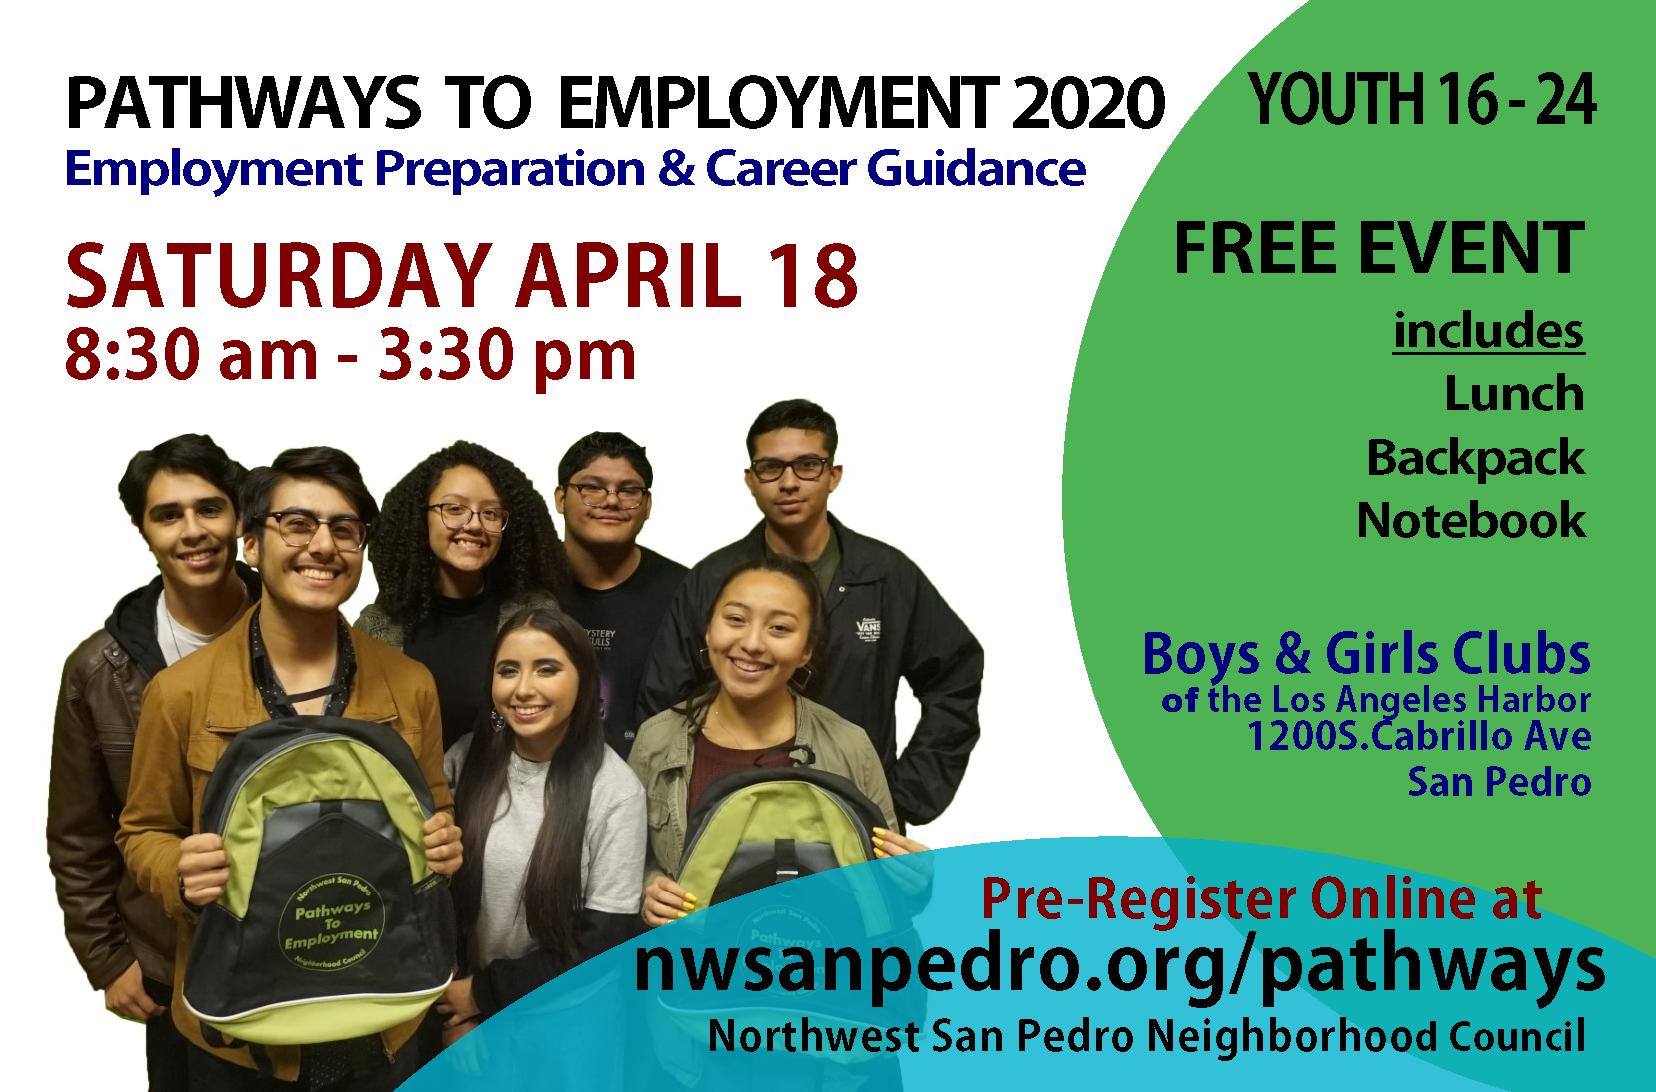 Pathways to Employment Event